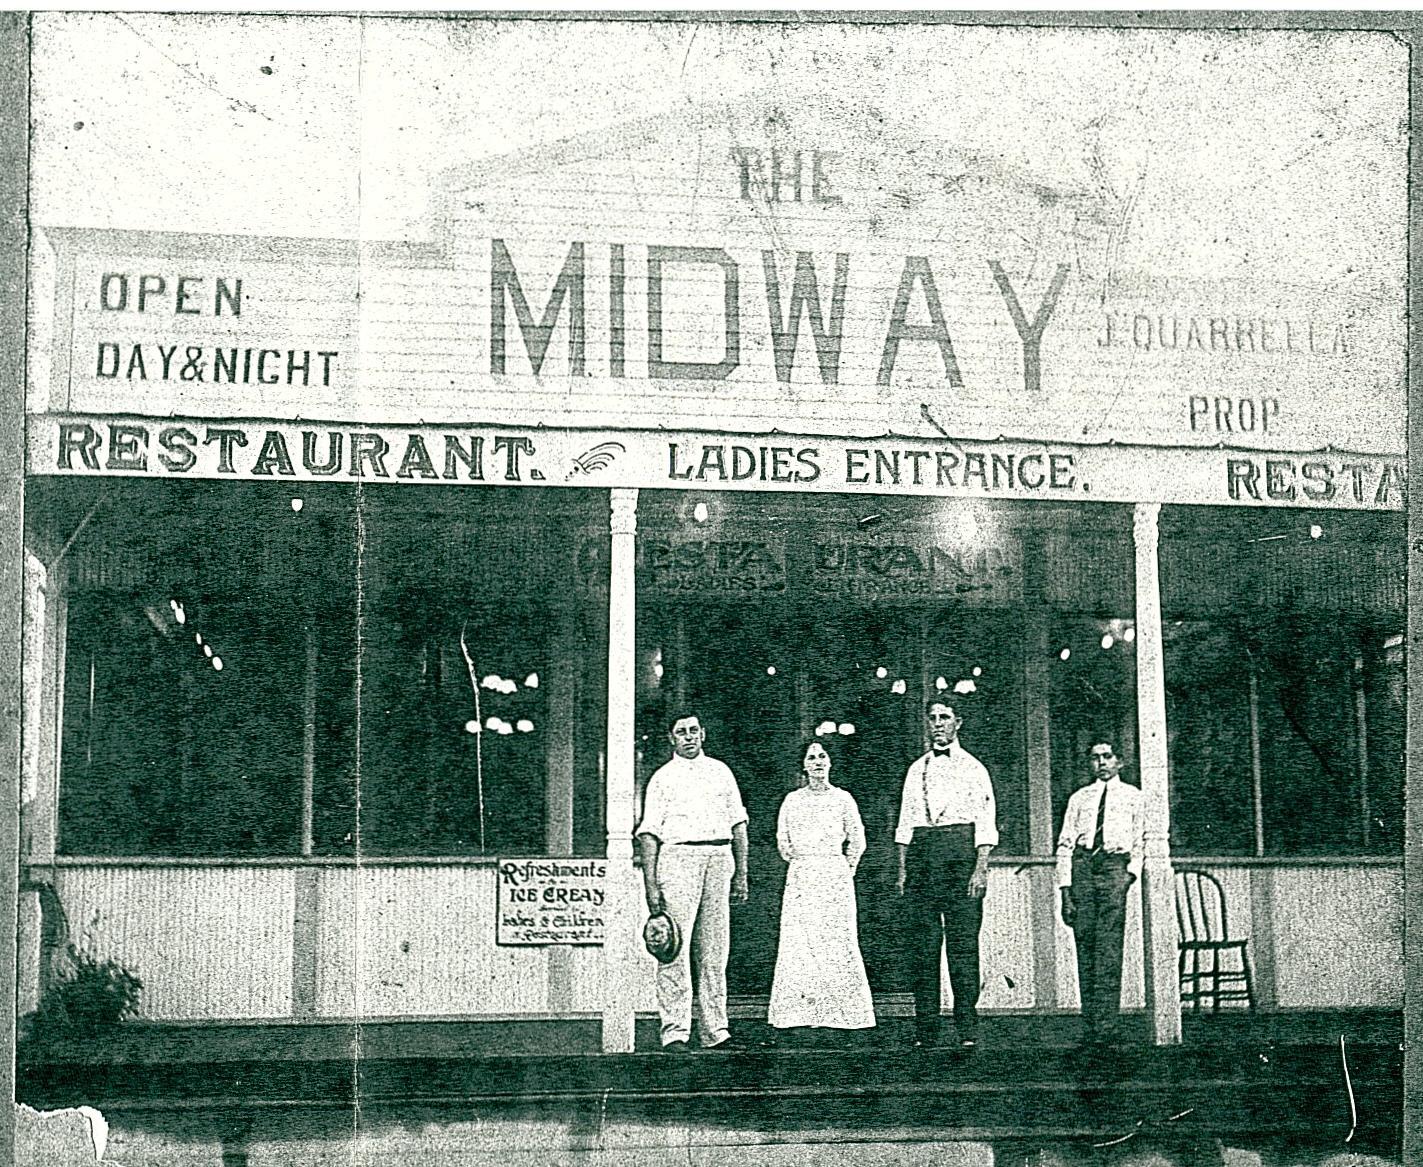 1914 - John Quarrella's Midway Restaurant at Milneburg